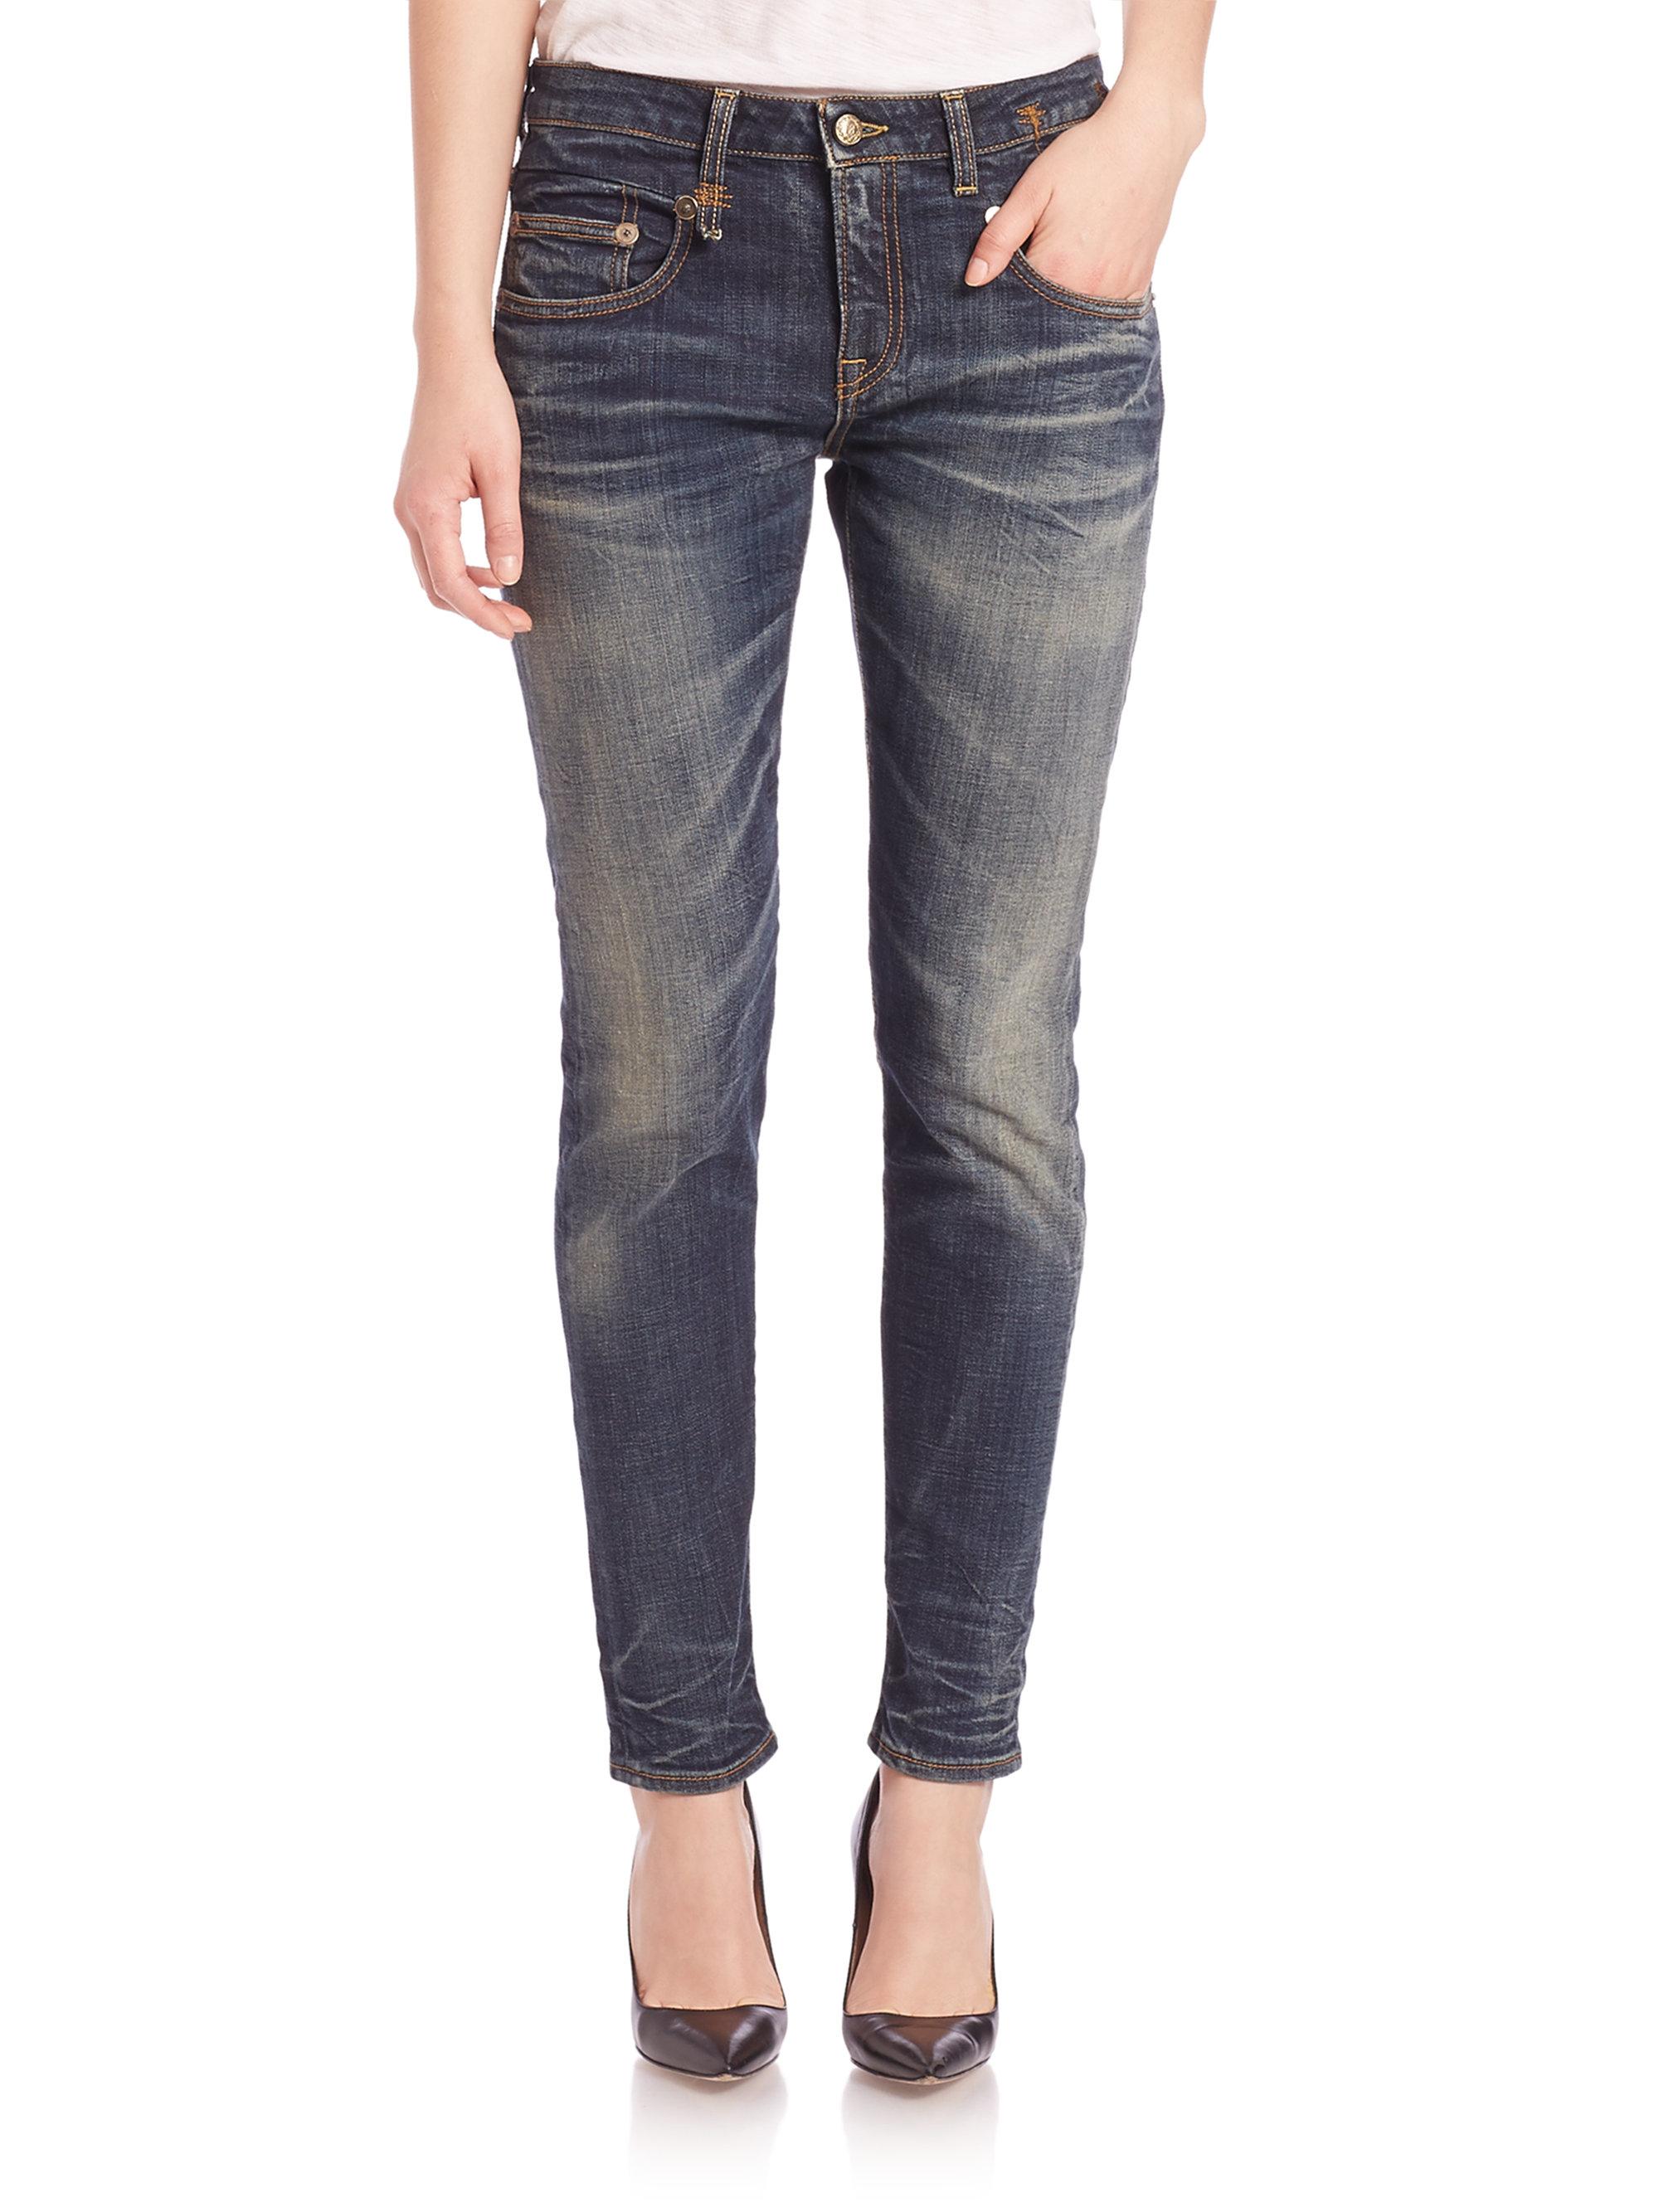 0958ea368 R13 Medium Blue Faded Boy Skinny Jeans in Blue - Lyst